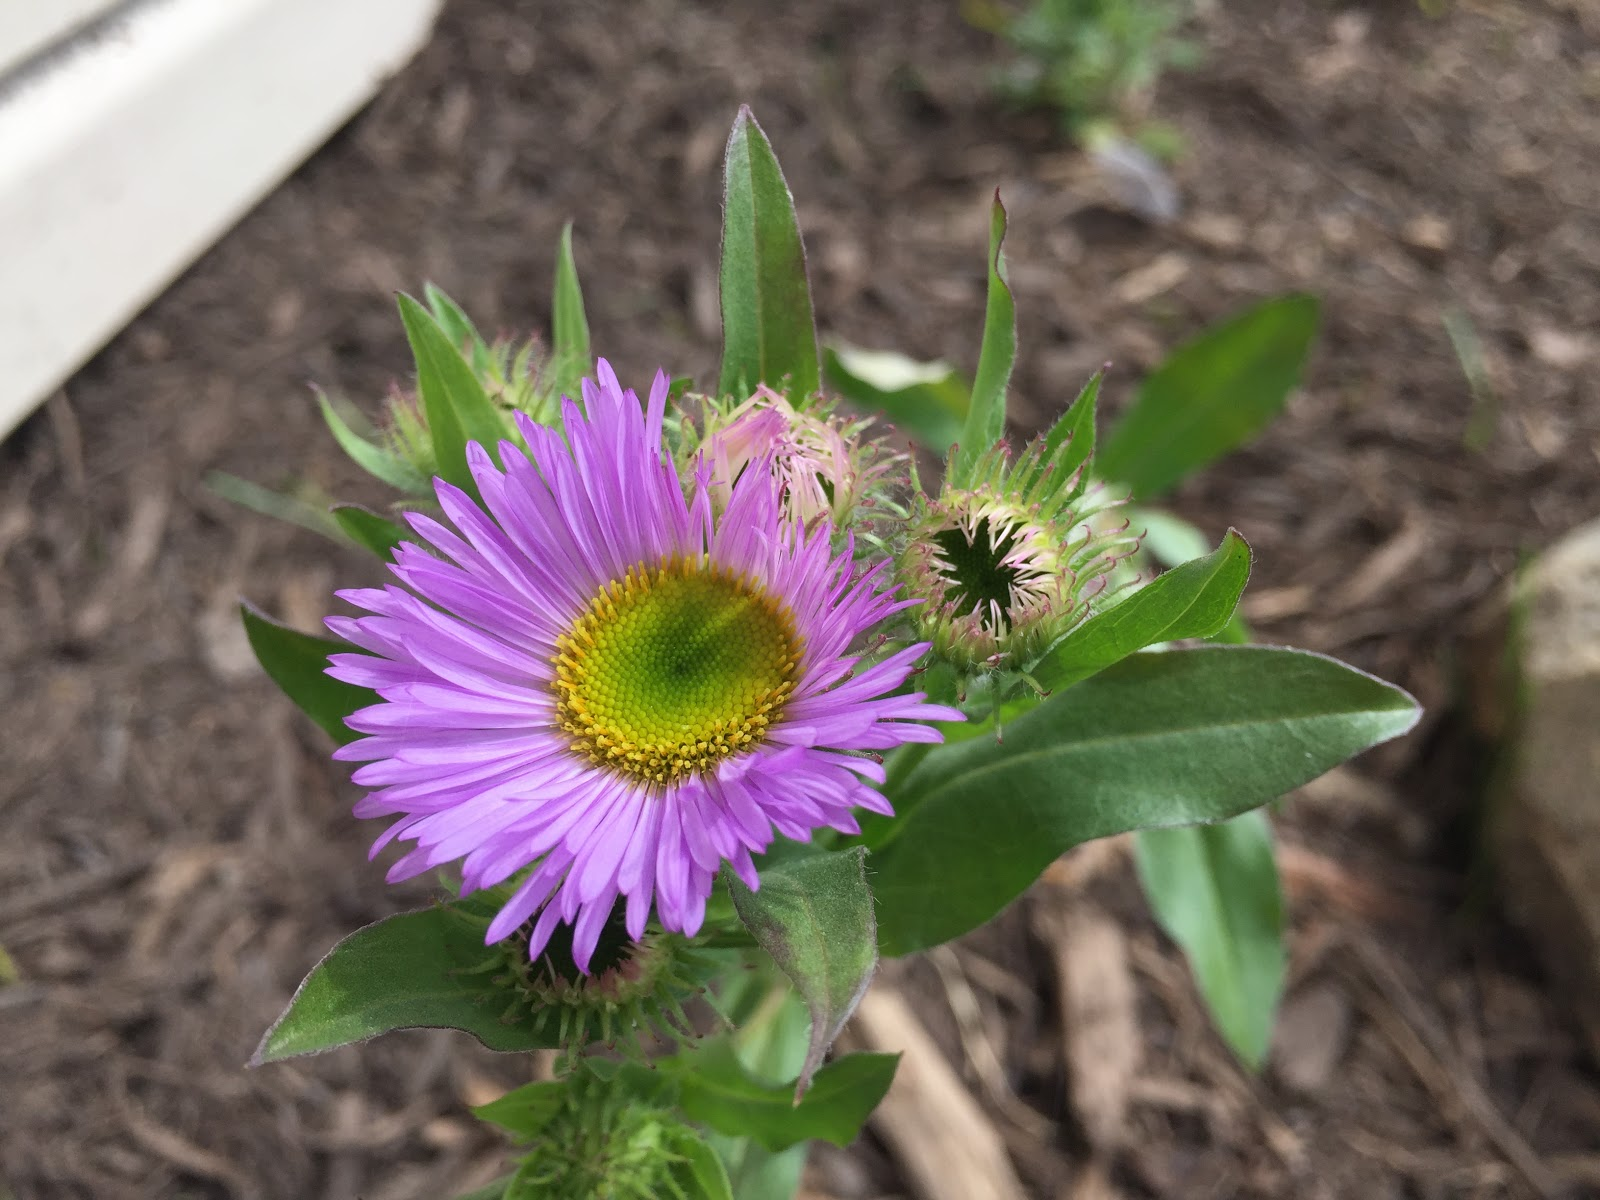 Erigeron speciosus 'Darkest of All' blooming